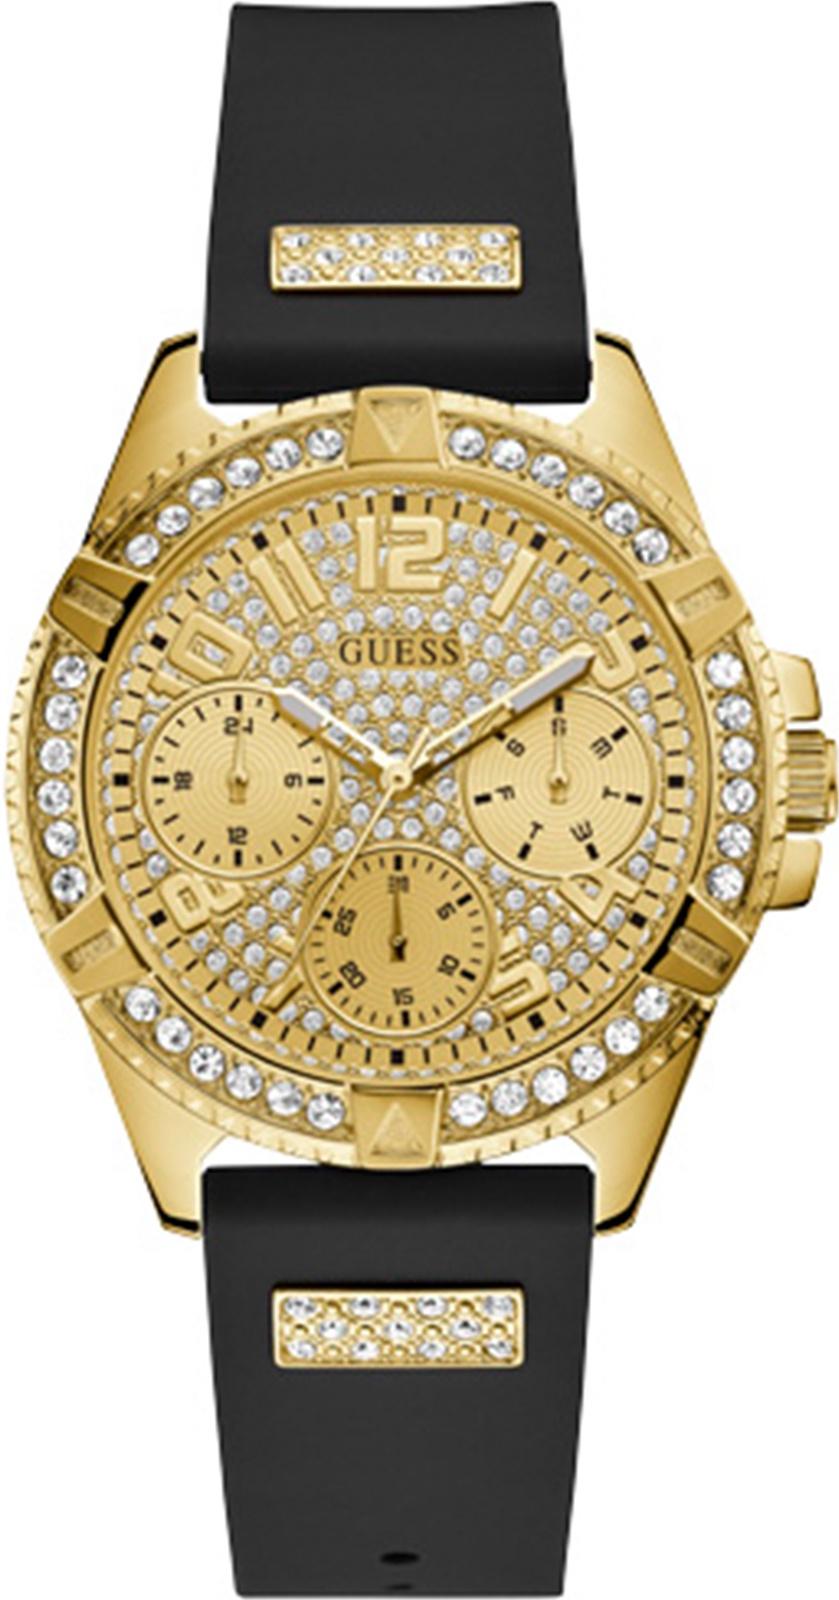 цена Часы Guess LADY FRONTIER онлайн в 2017 году